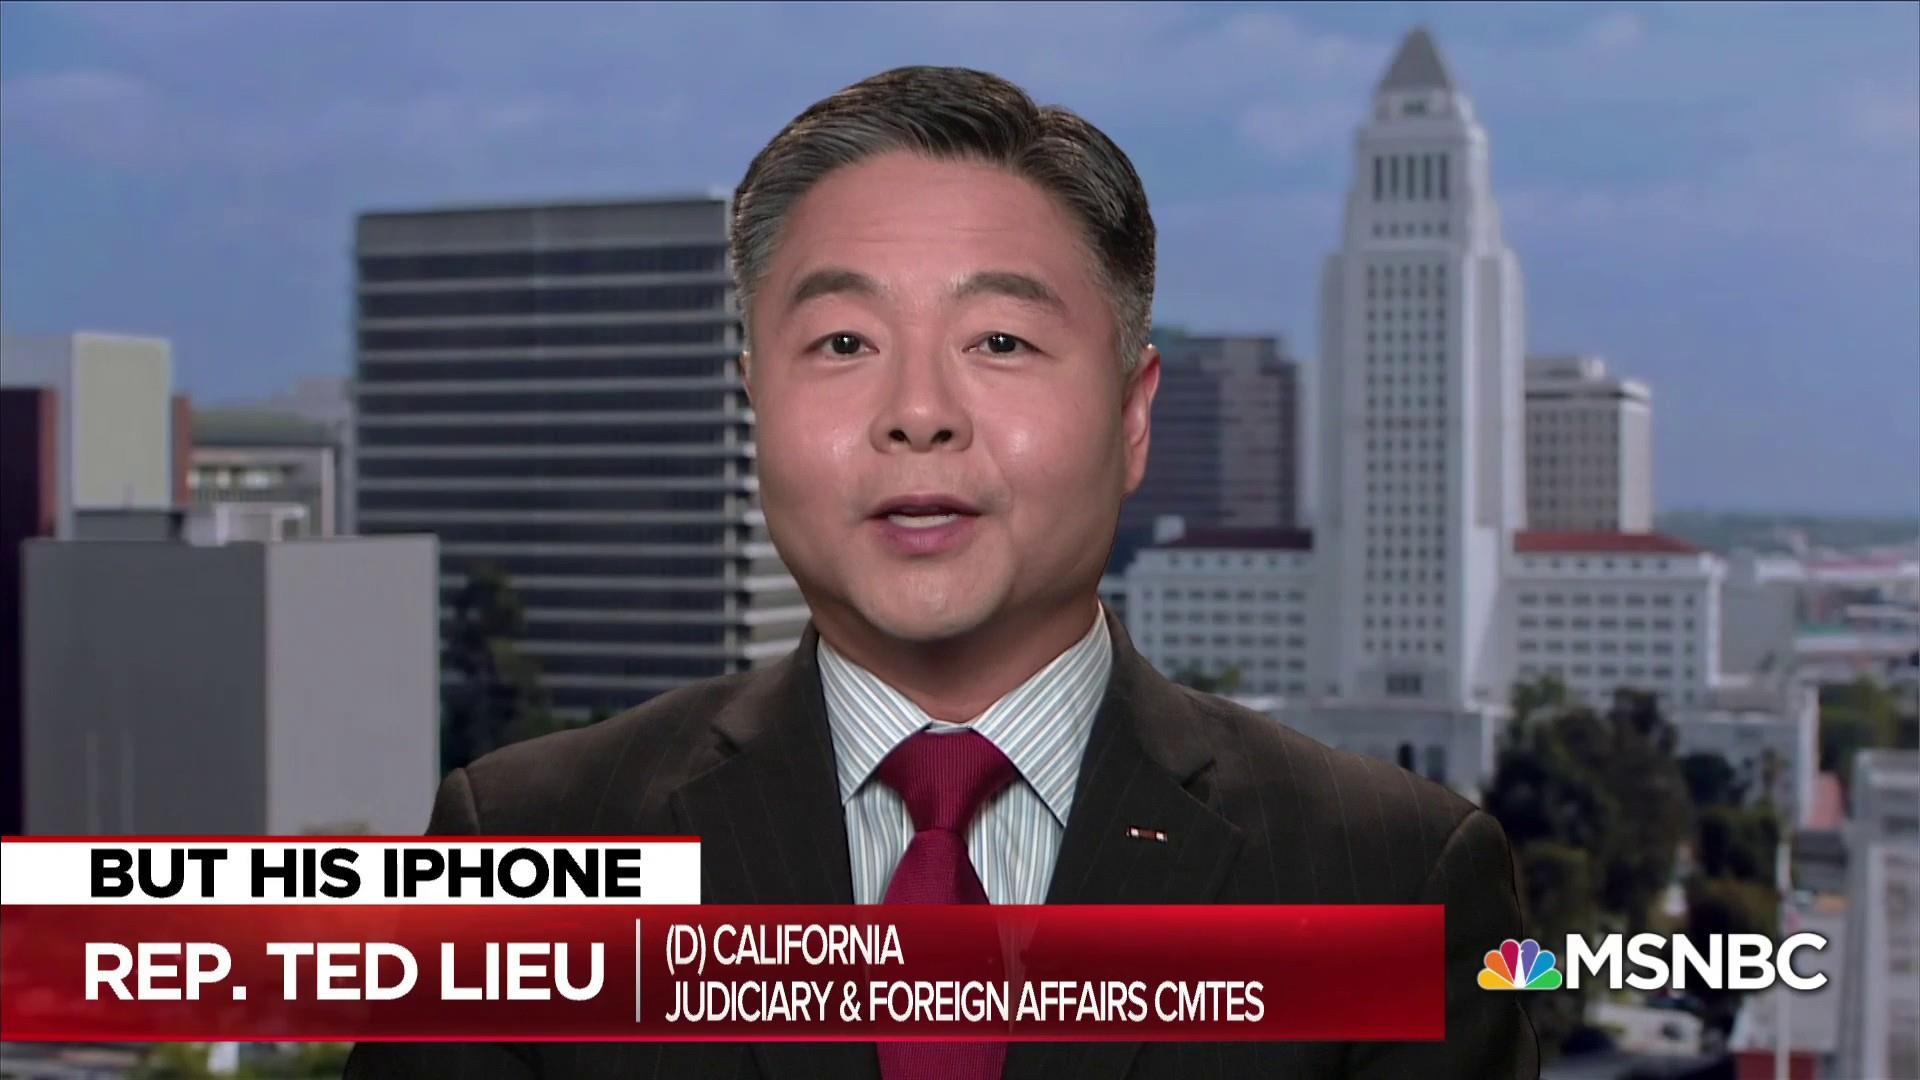 Congressman Lieu destroys Trump over email and iPhone hypocrisy